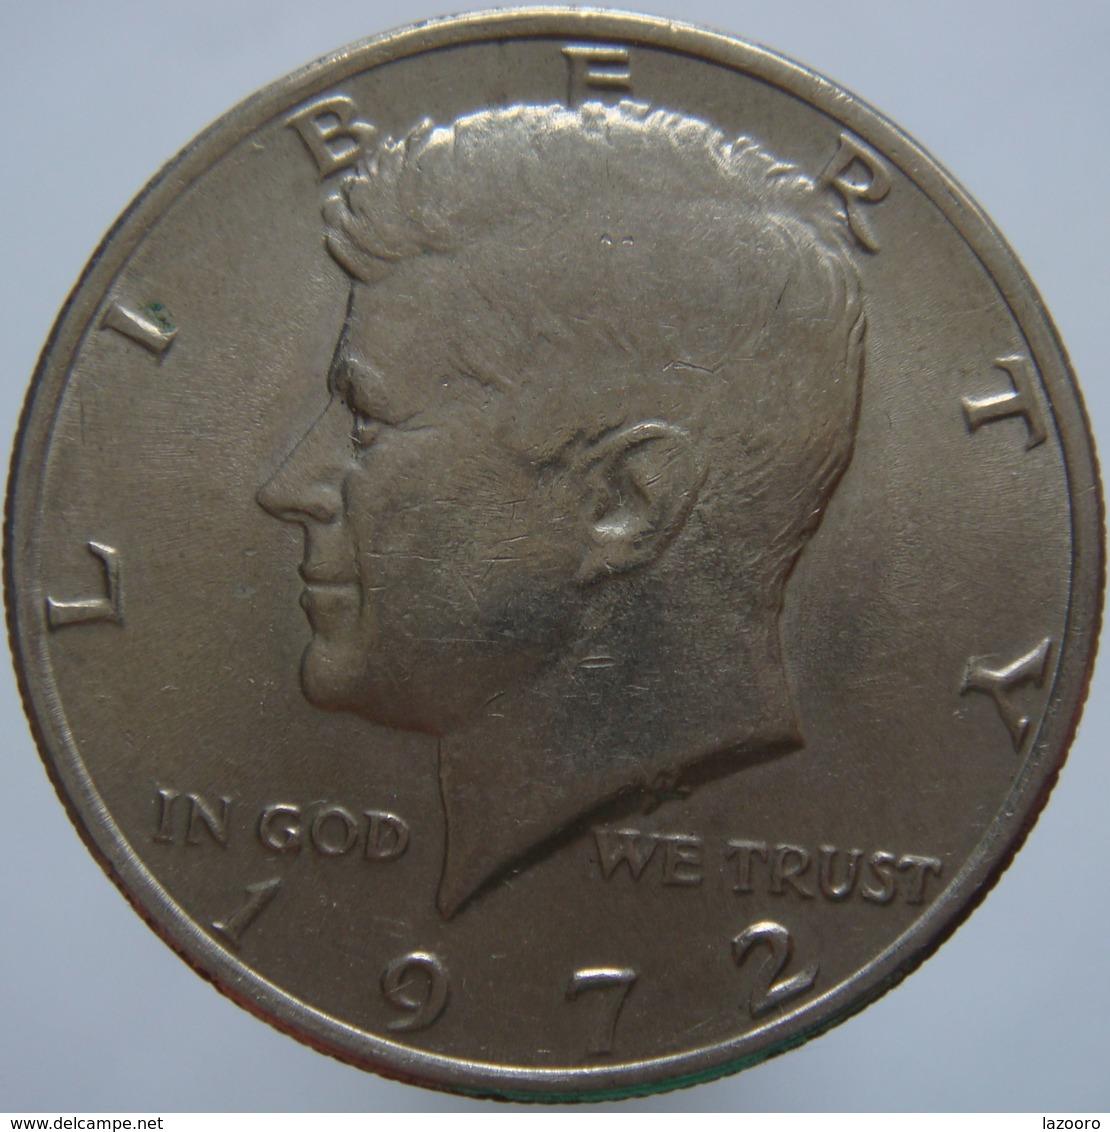 USA United States USA 1/2 Dollar 1972 VF/XF - Federal Issues